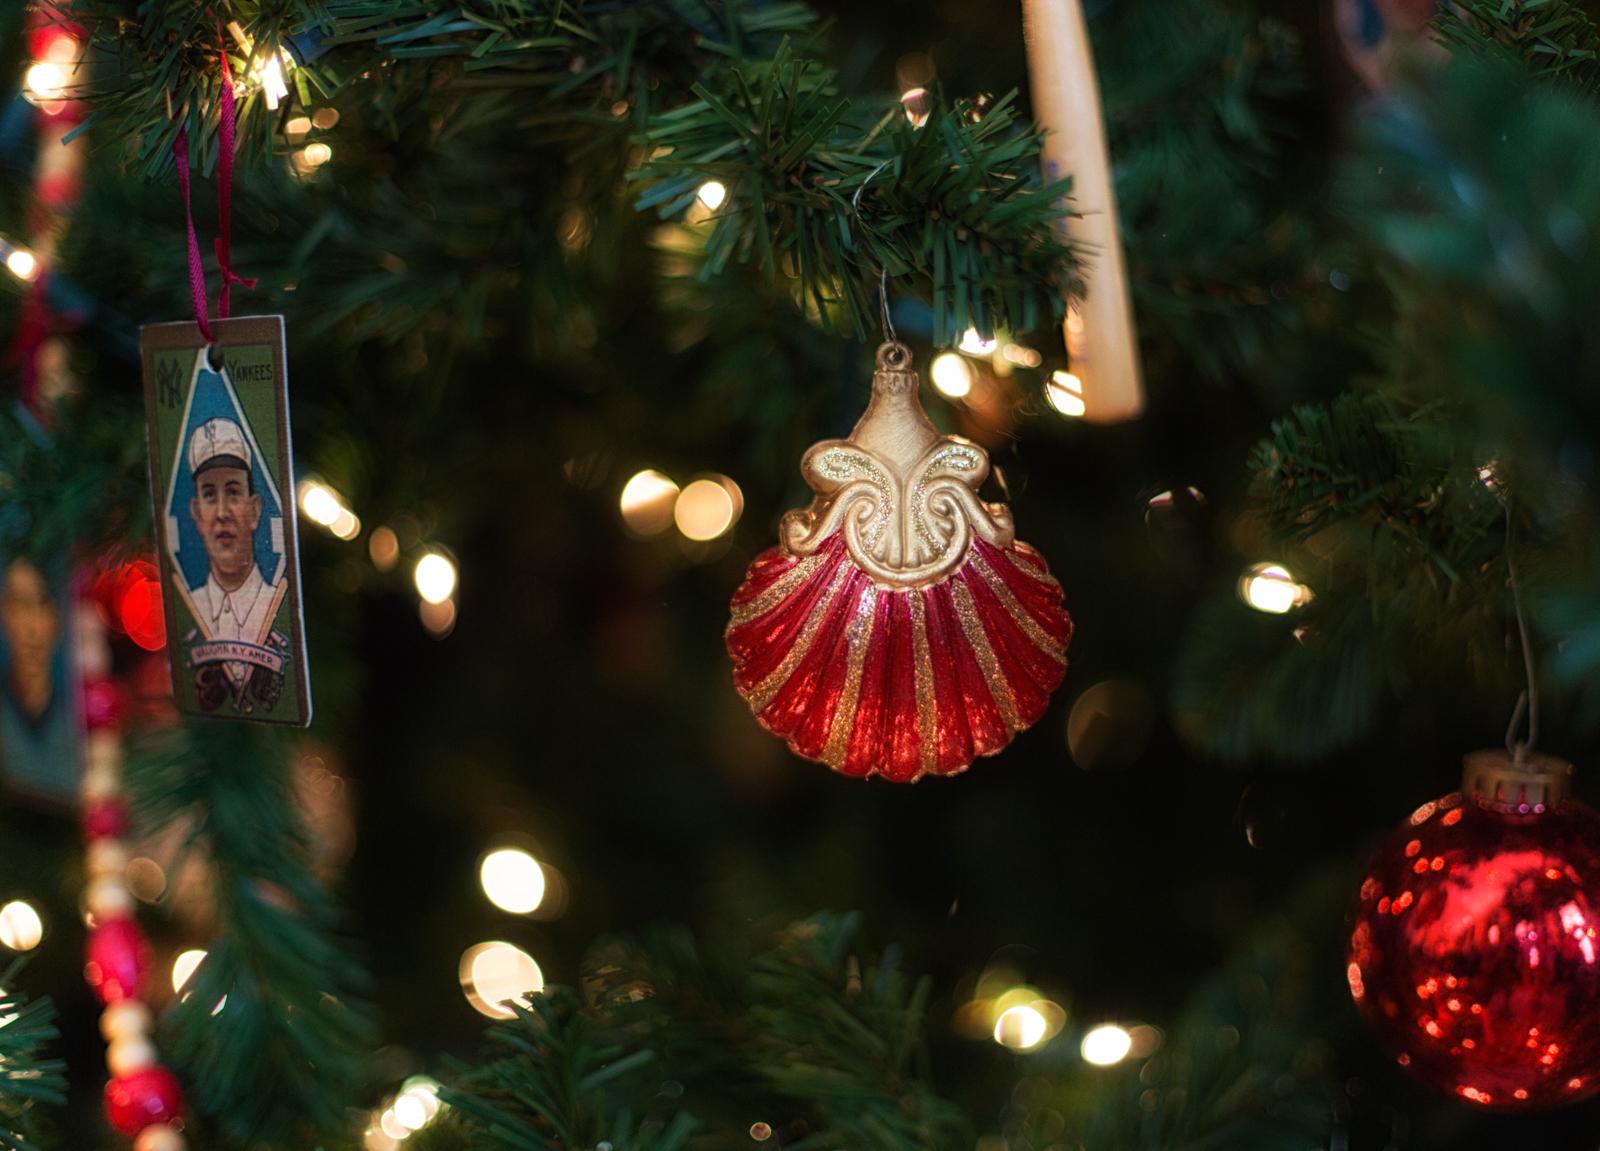 Christmas Ornaments Galore